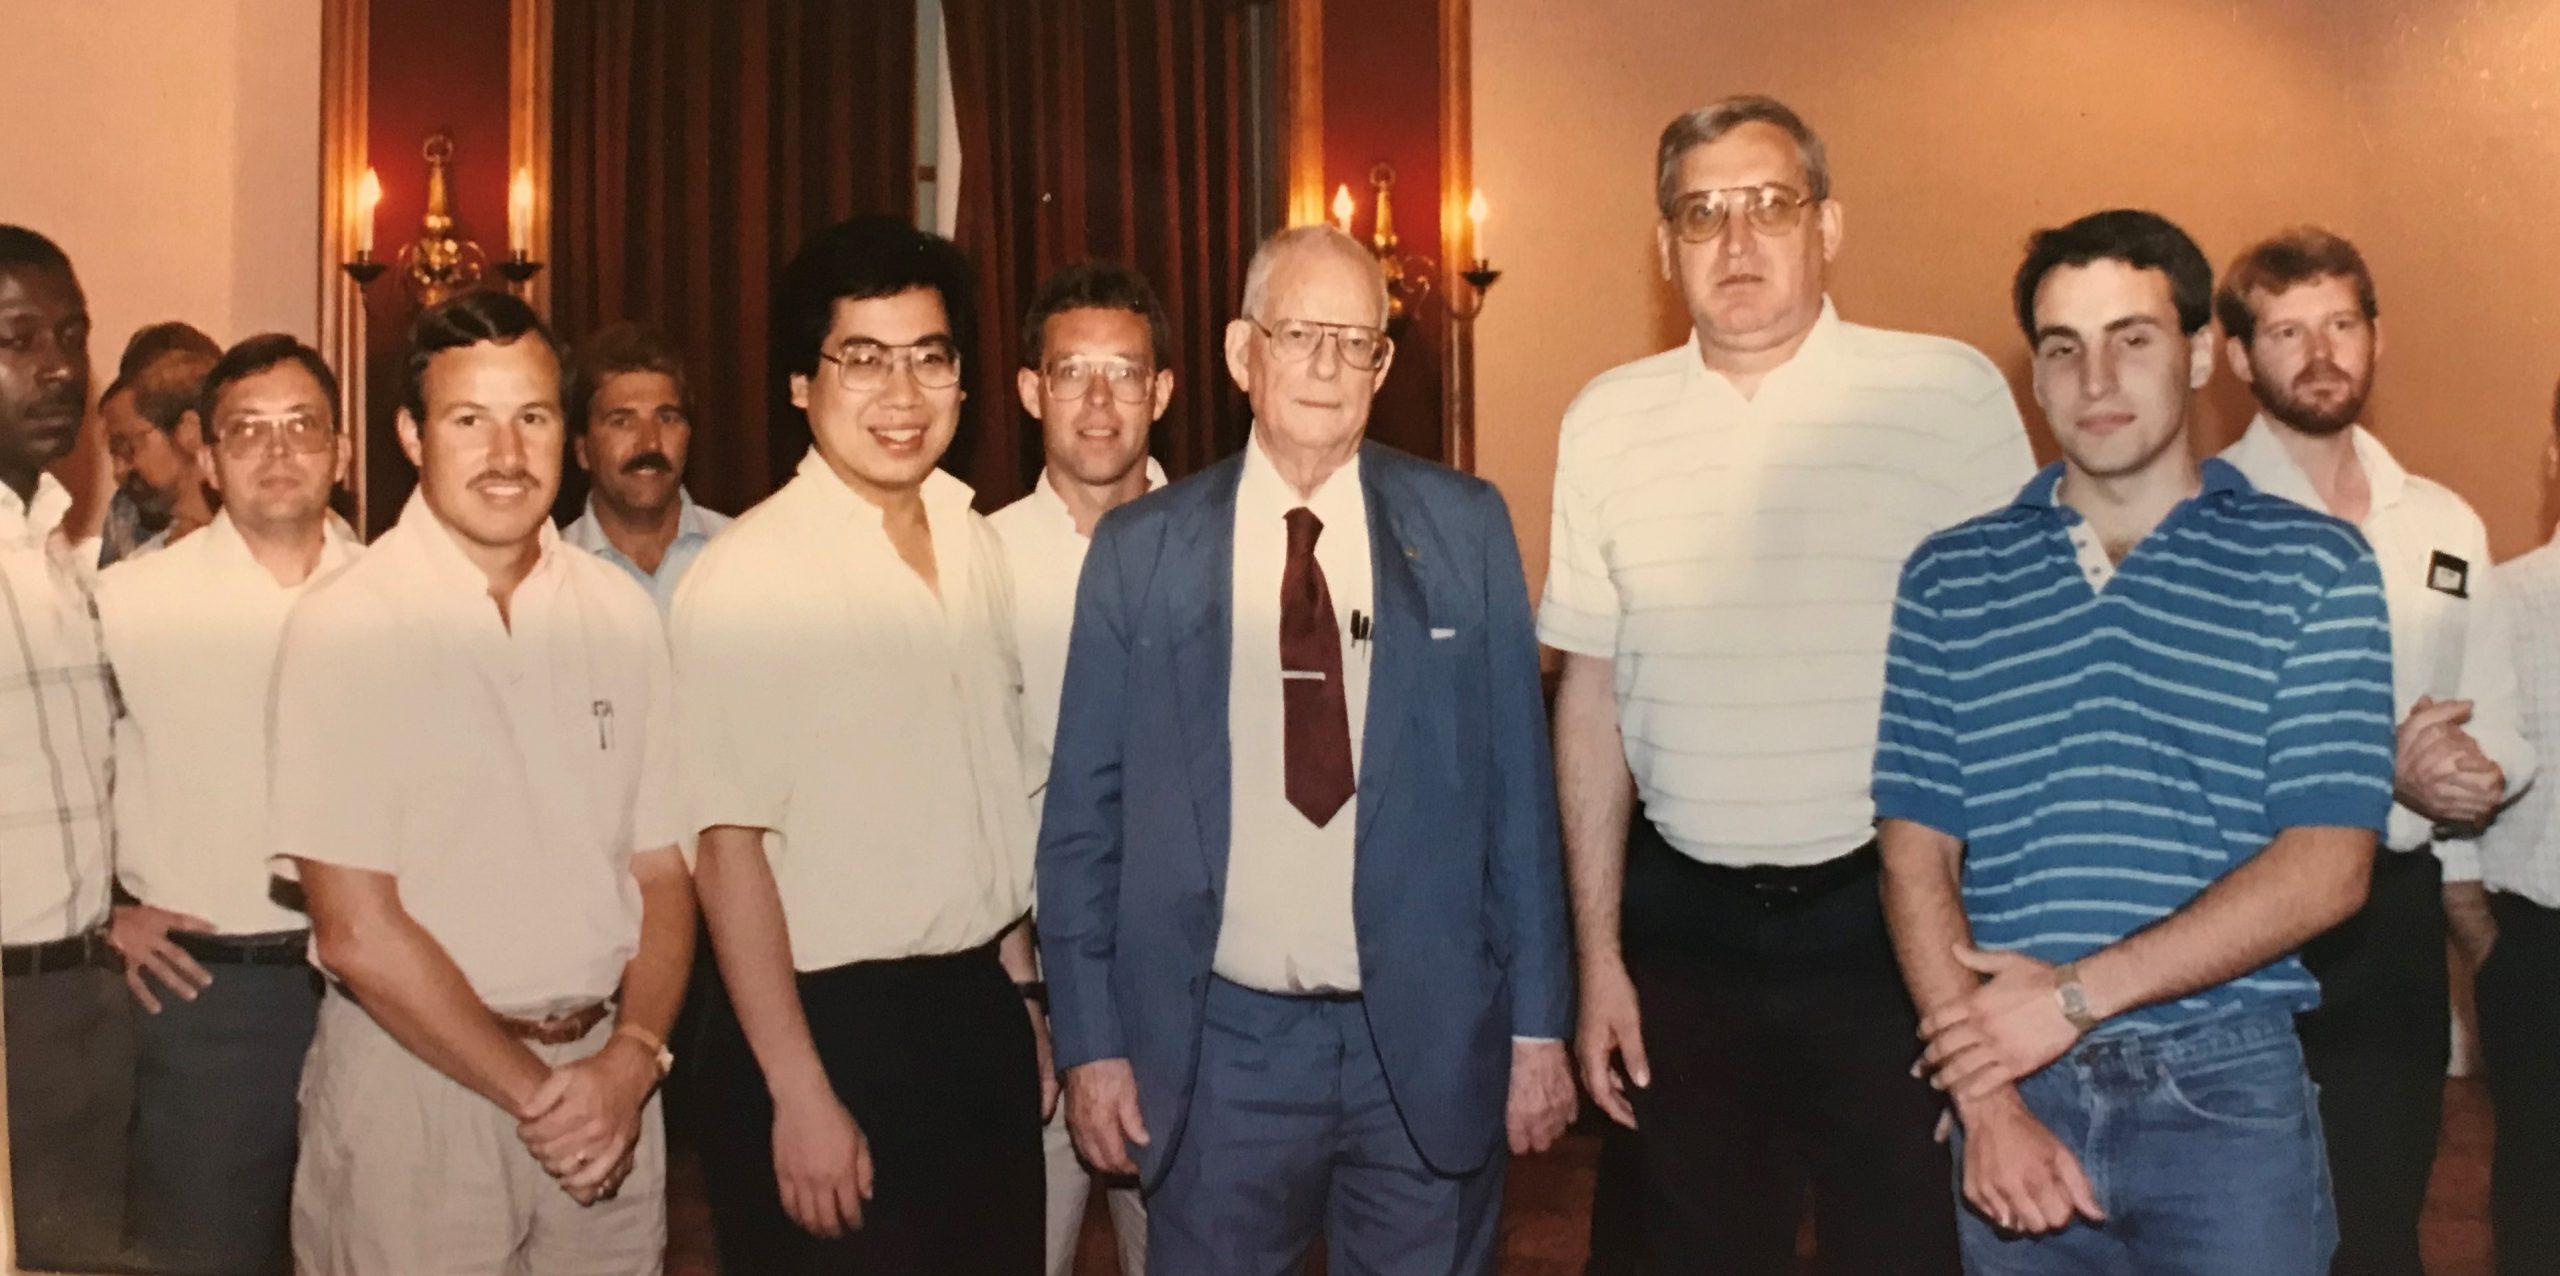 Mementos Steve Beeler with Dr Deming circa 1989